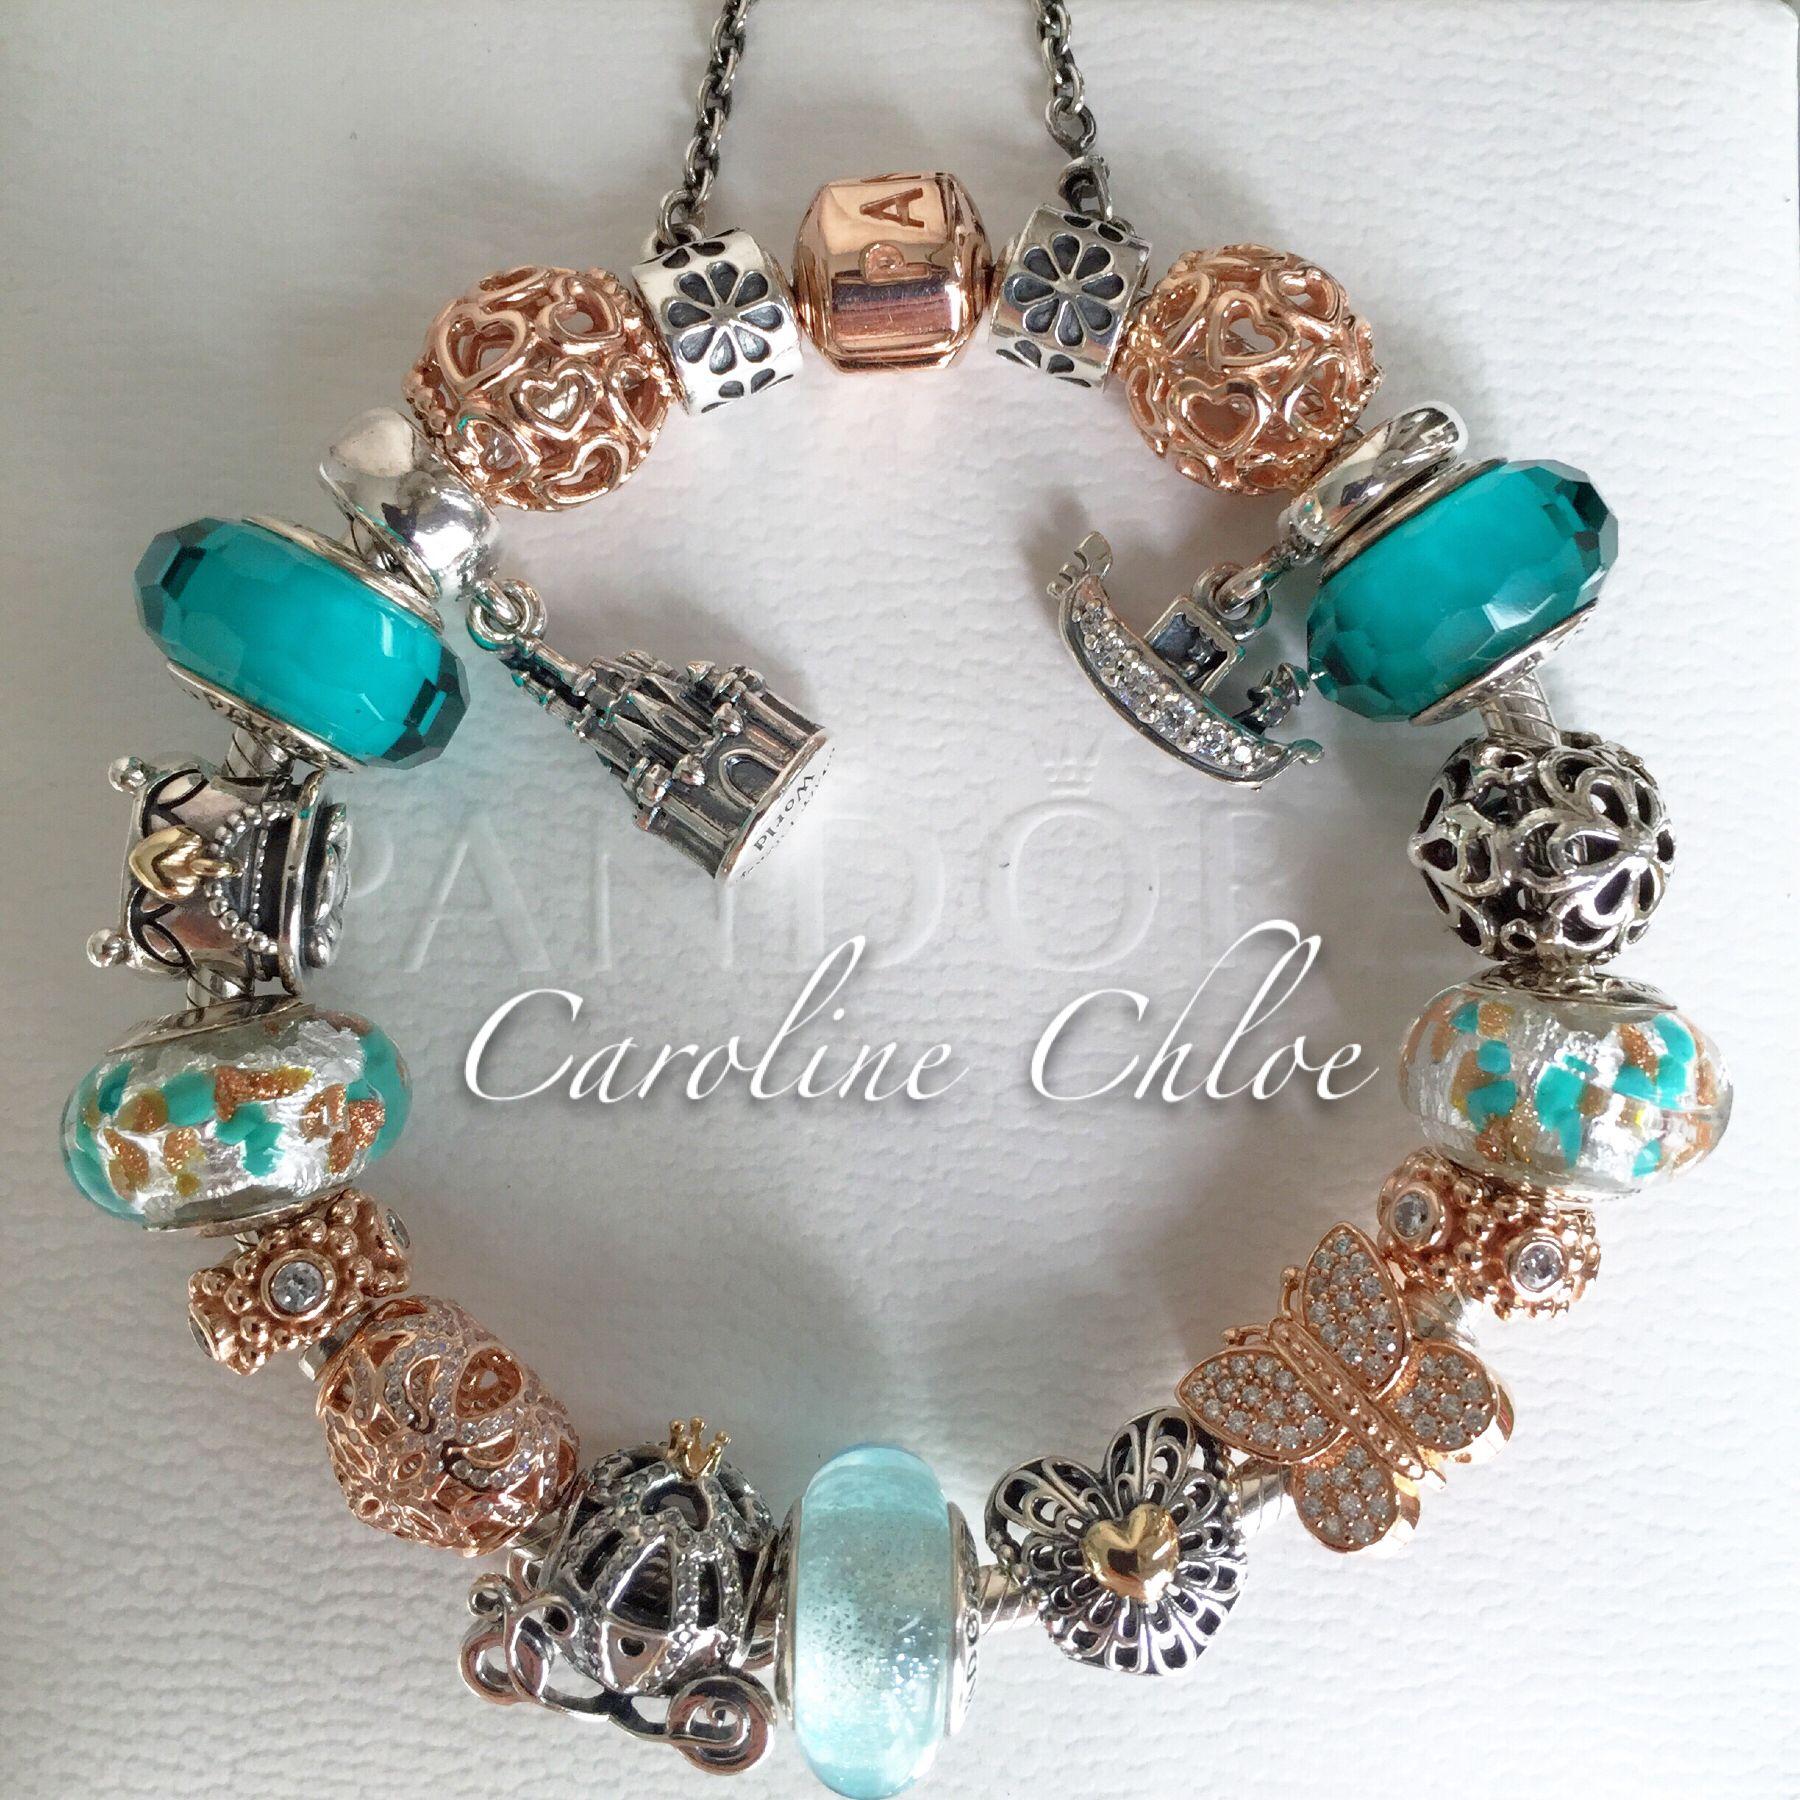 Pandora rose and teal | Pandora jewelry, Rose gold jewelry ...